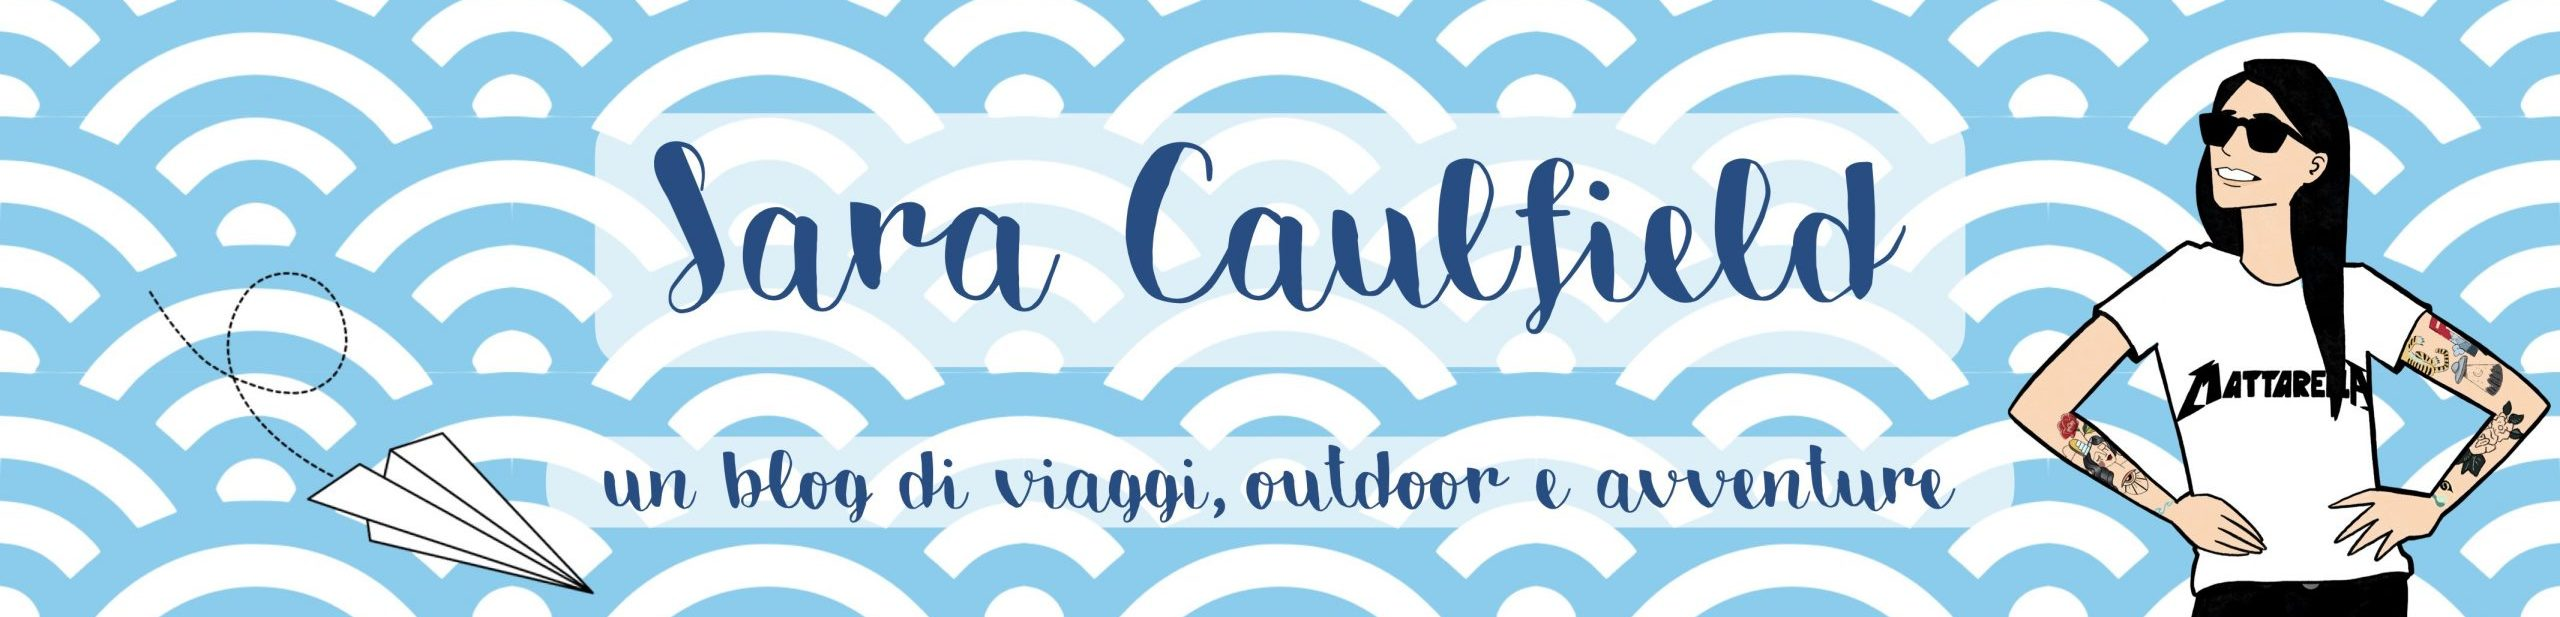 Sara Caulfield